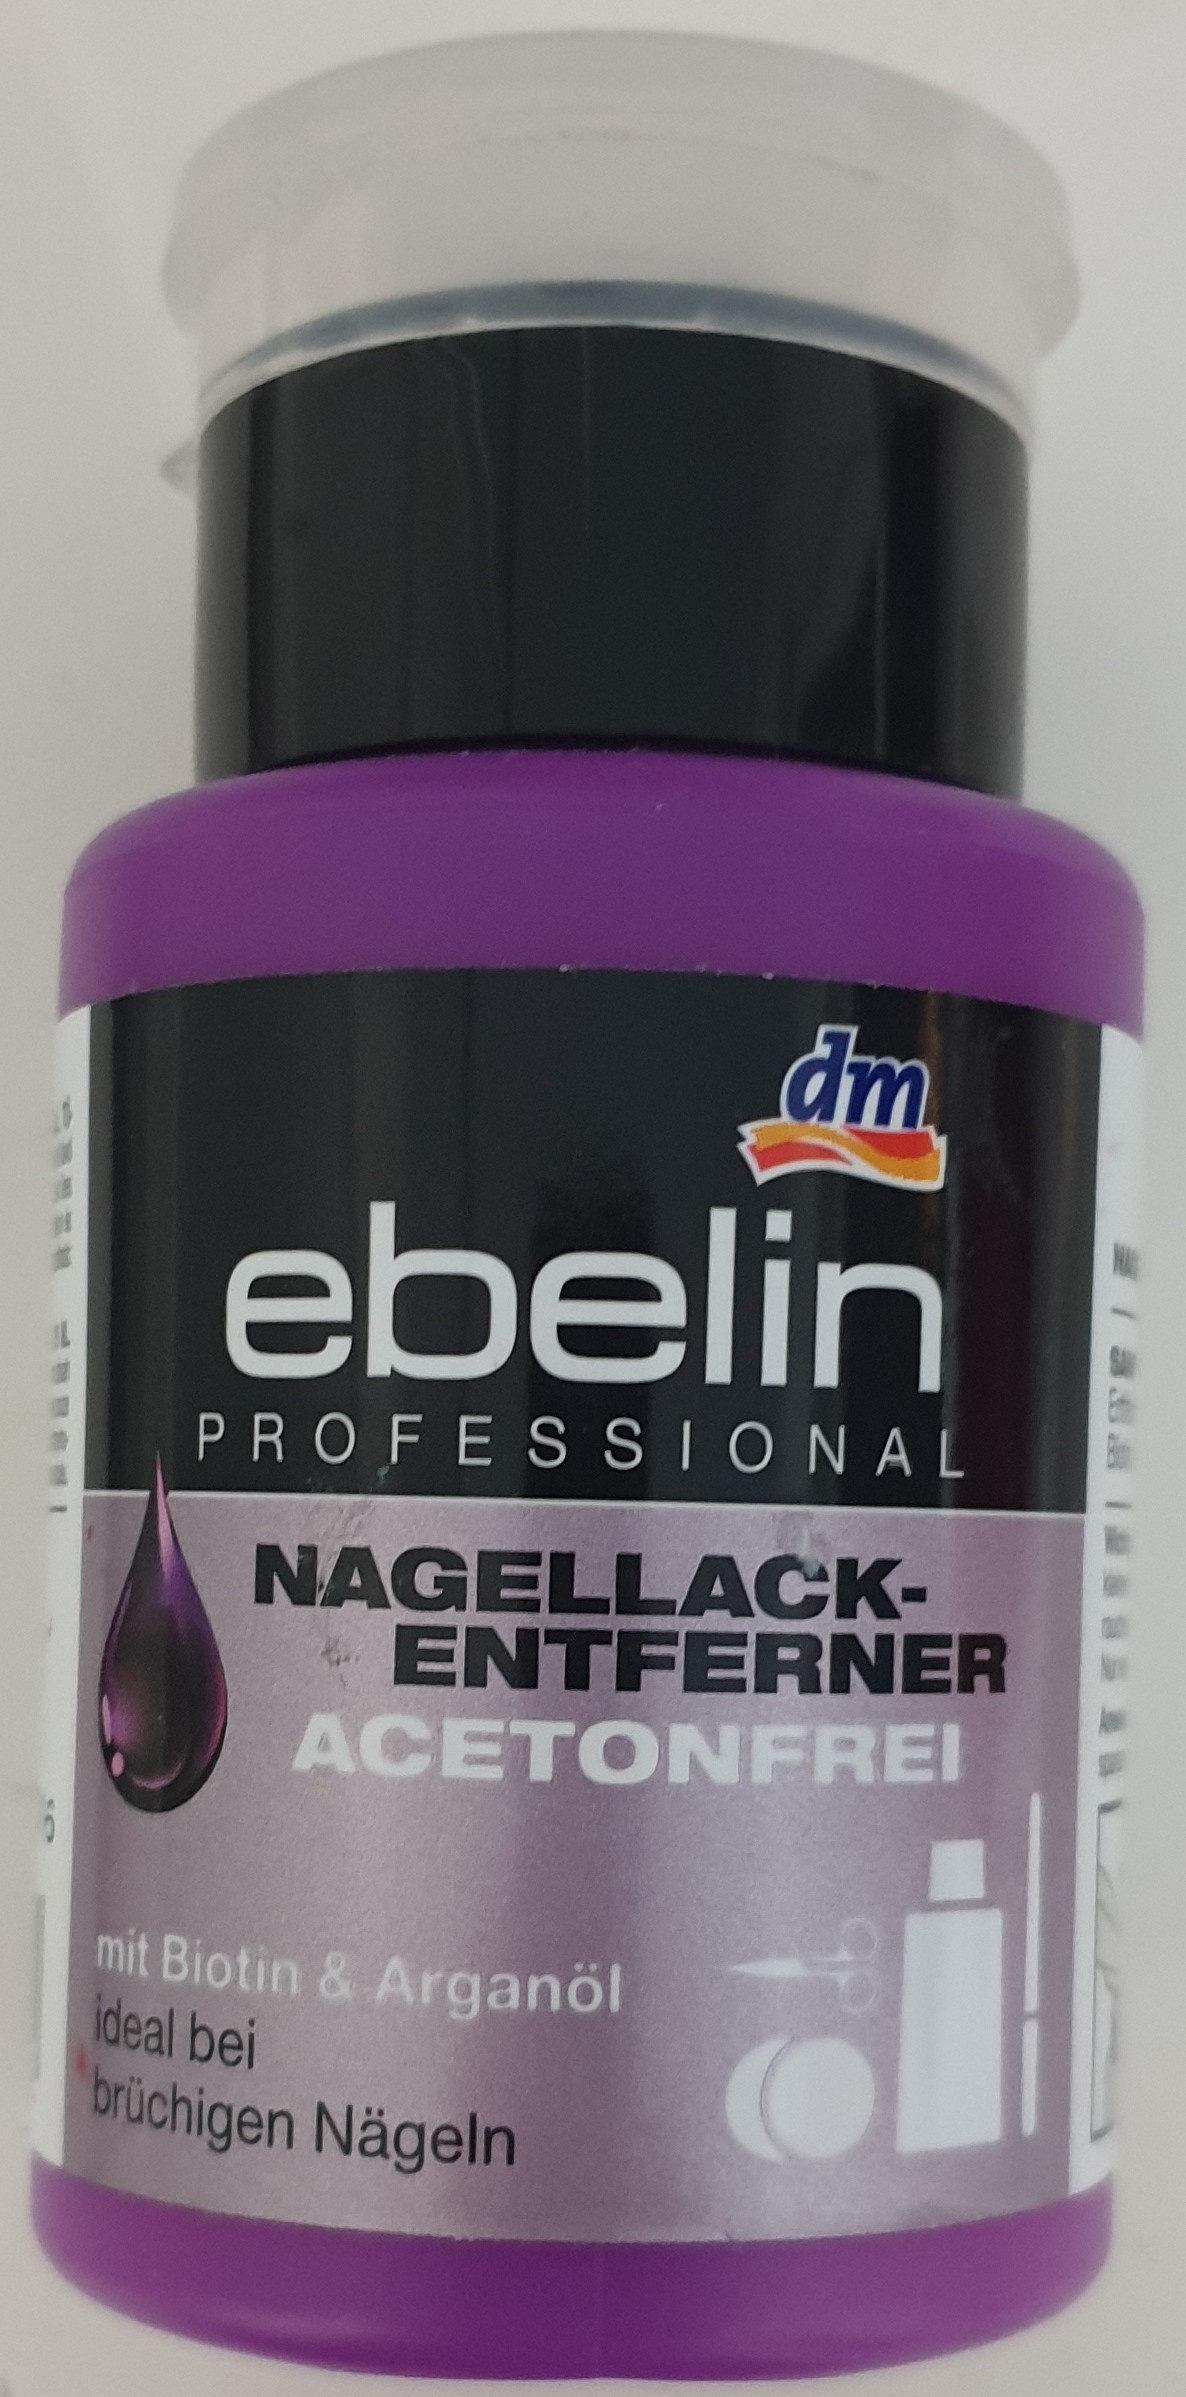 Nagellackentferner acetonfrei - Produit - de